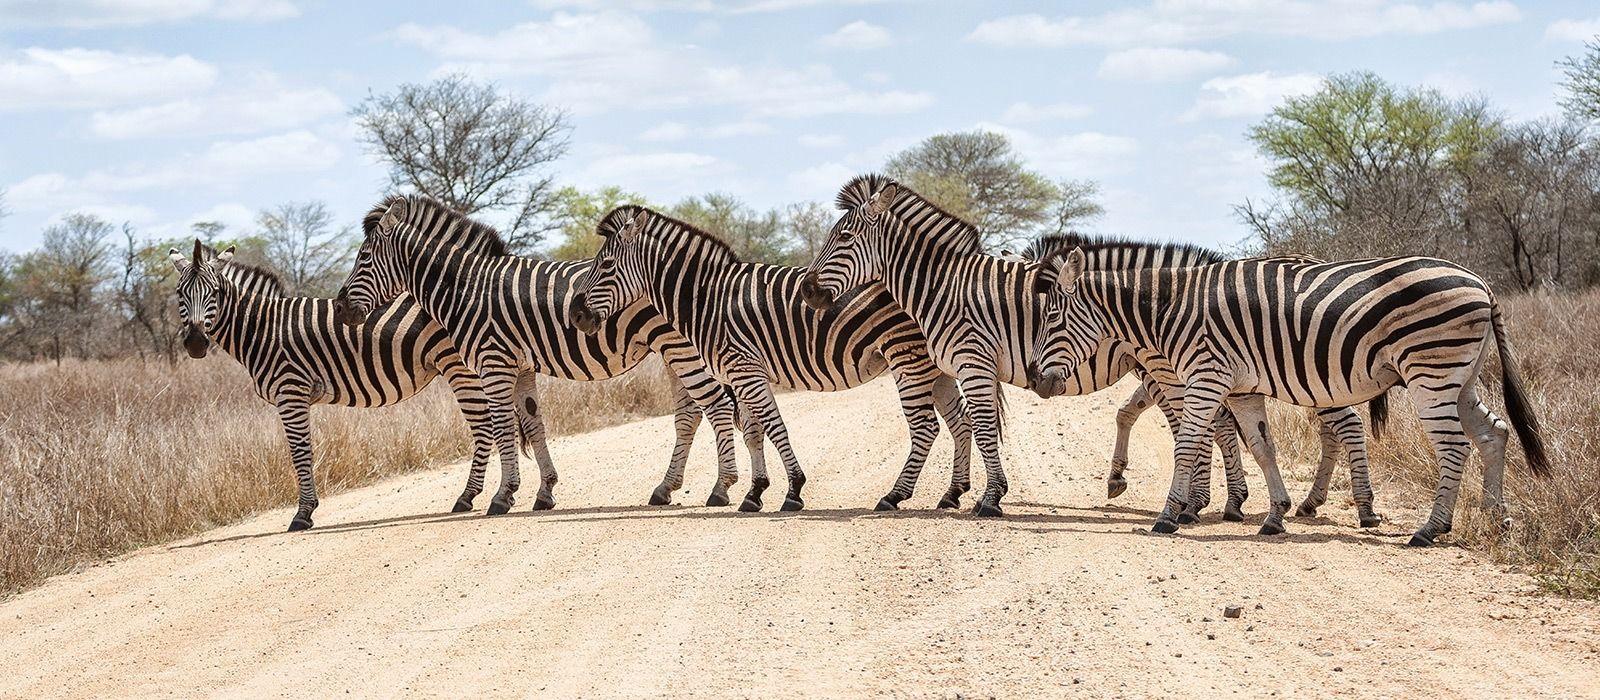 Rundreise Johannesburg nach Kapstadt – Südafrikas Höhepunkte Urlaub 3